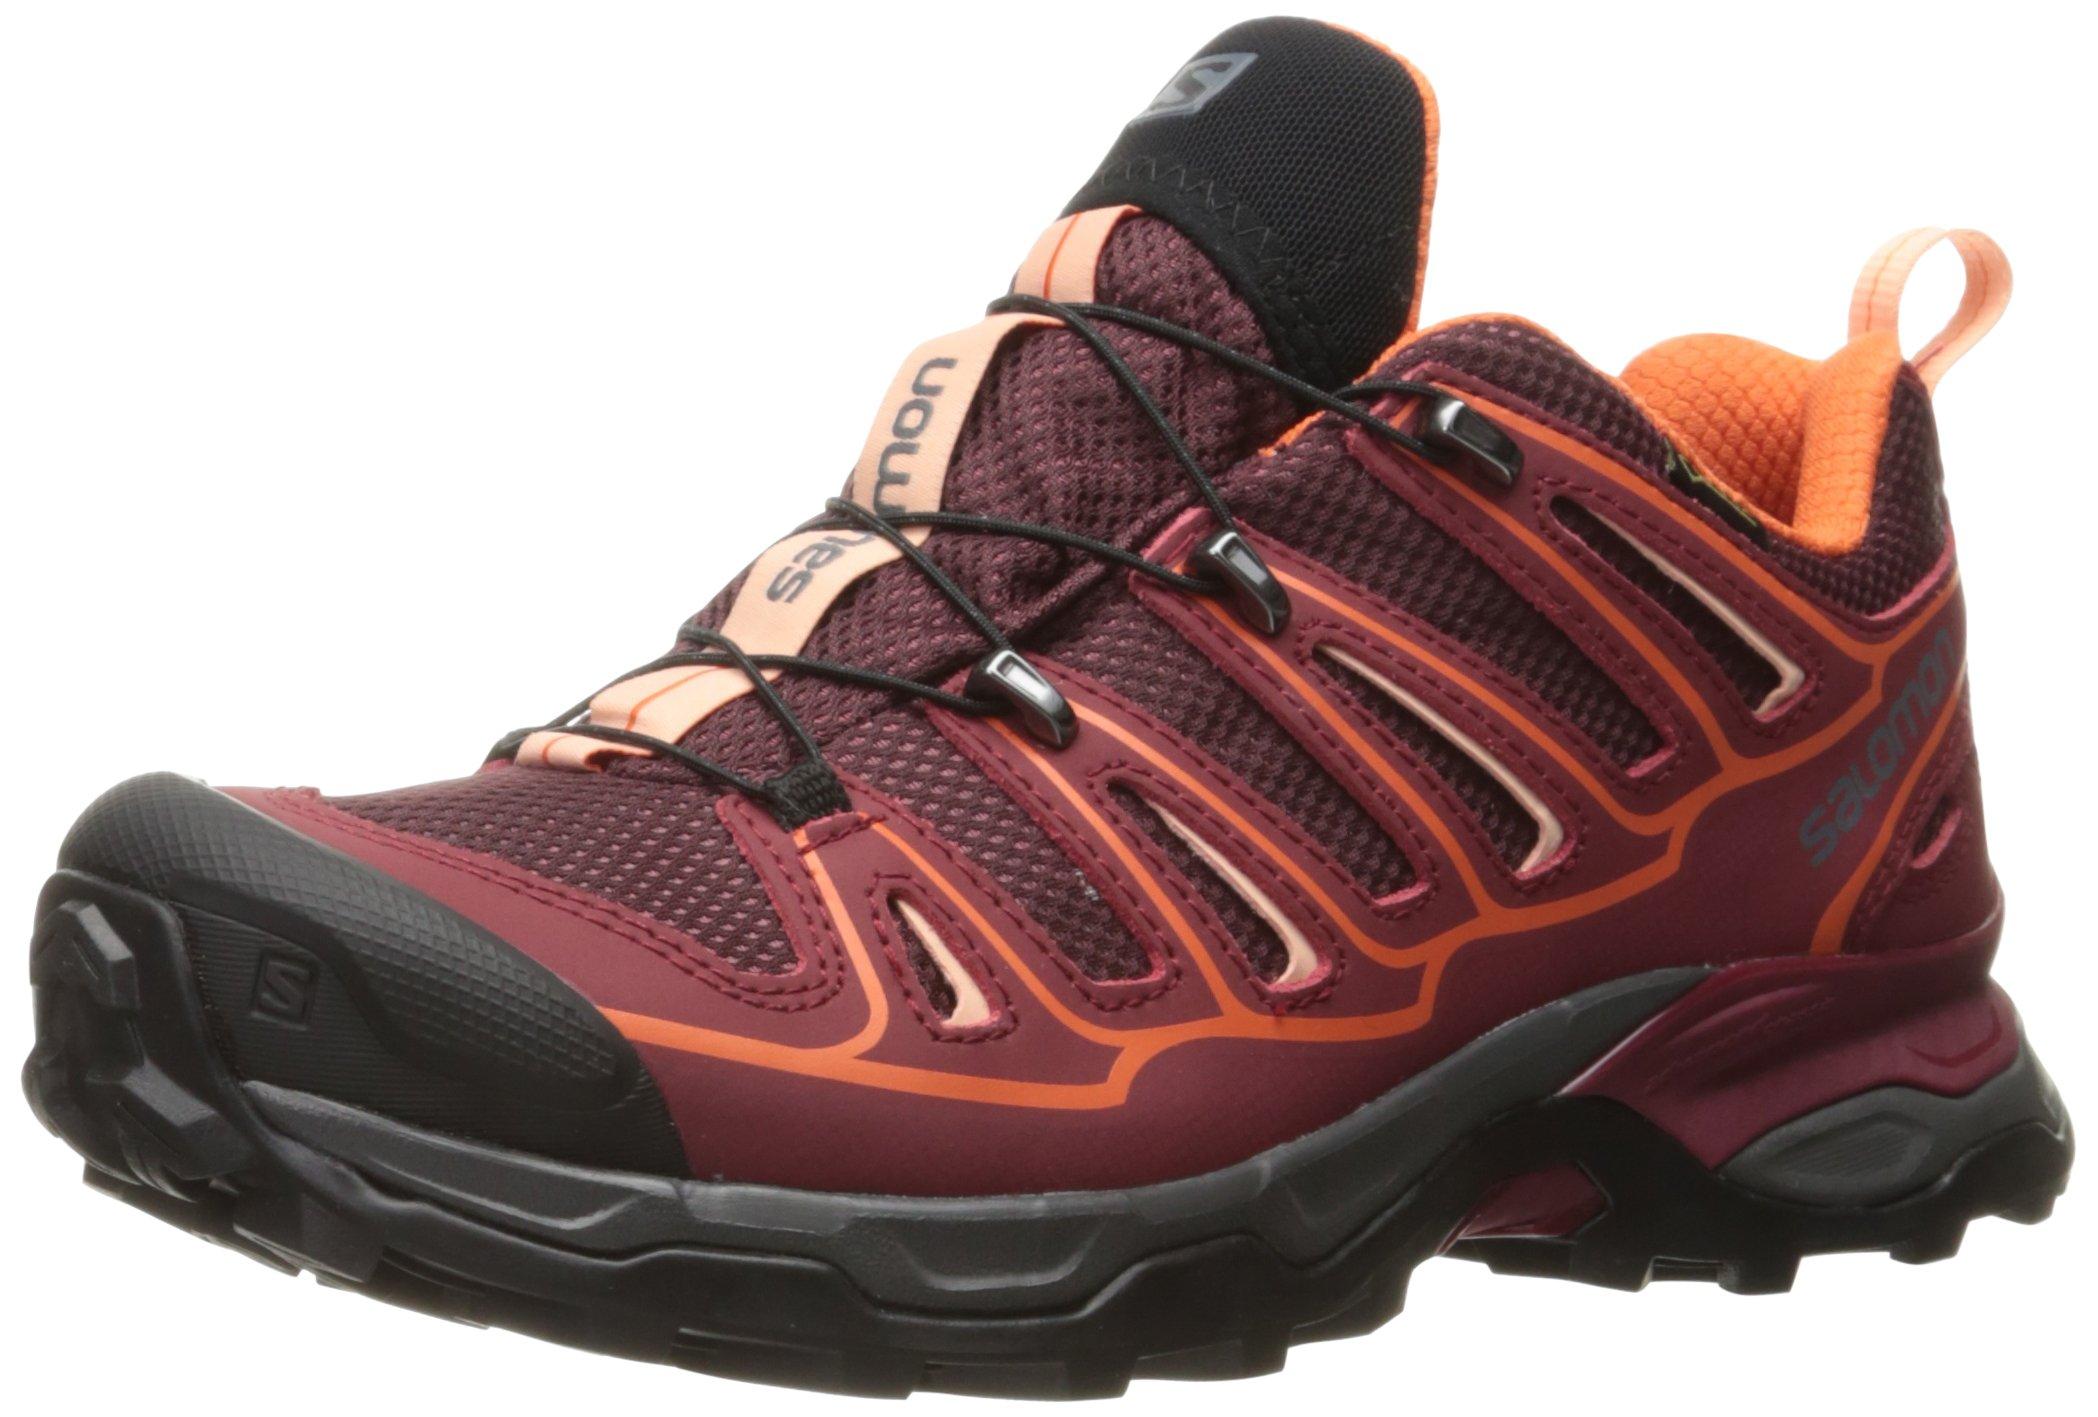 Salomon Women's X Ultra 2 Gtx W Trail Runner, Fig/Tibetan Red/Flame, 9.5 B